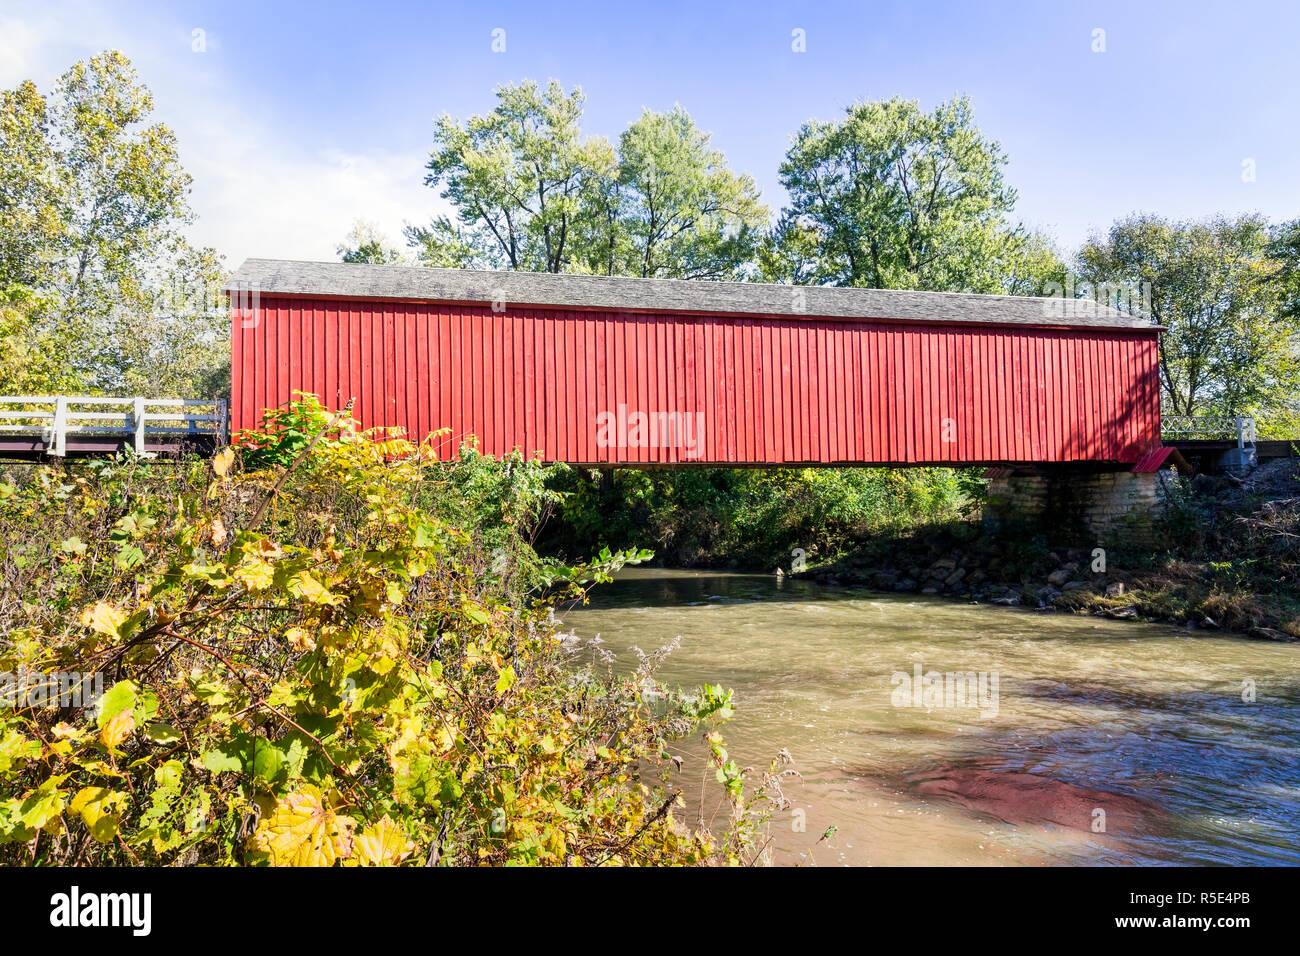 Built in 1863, Red Bridge, a covered bridge near Princeton, Illinois, spans Big Bureau Creek. Stock Photo